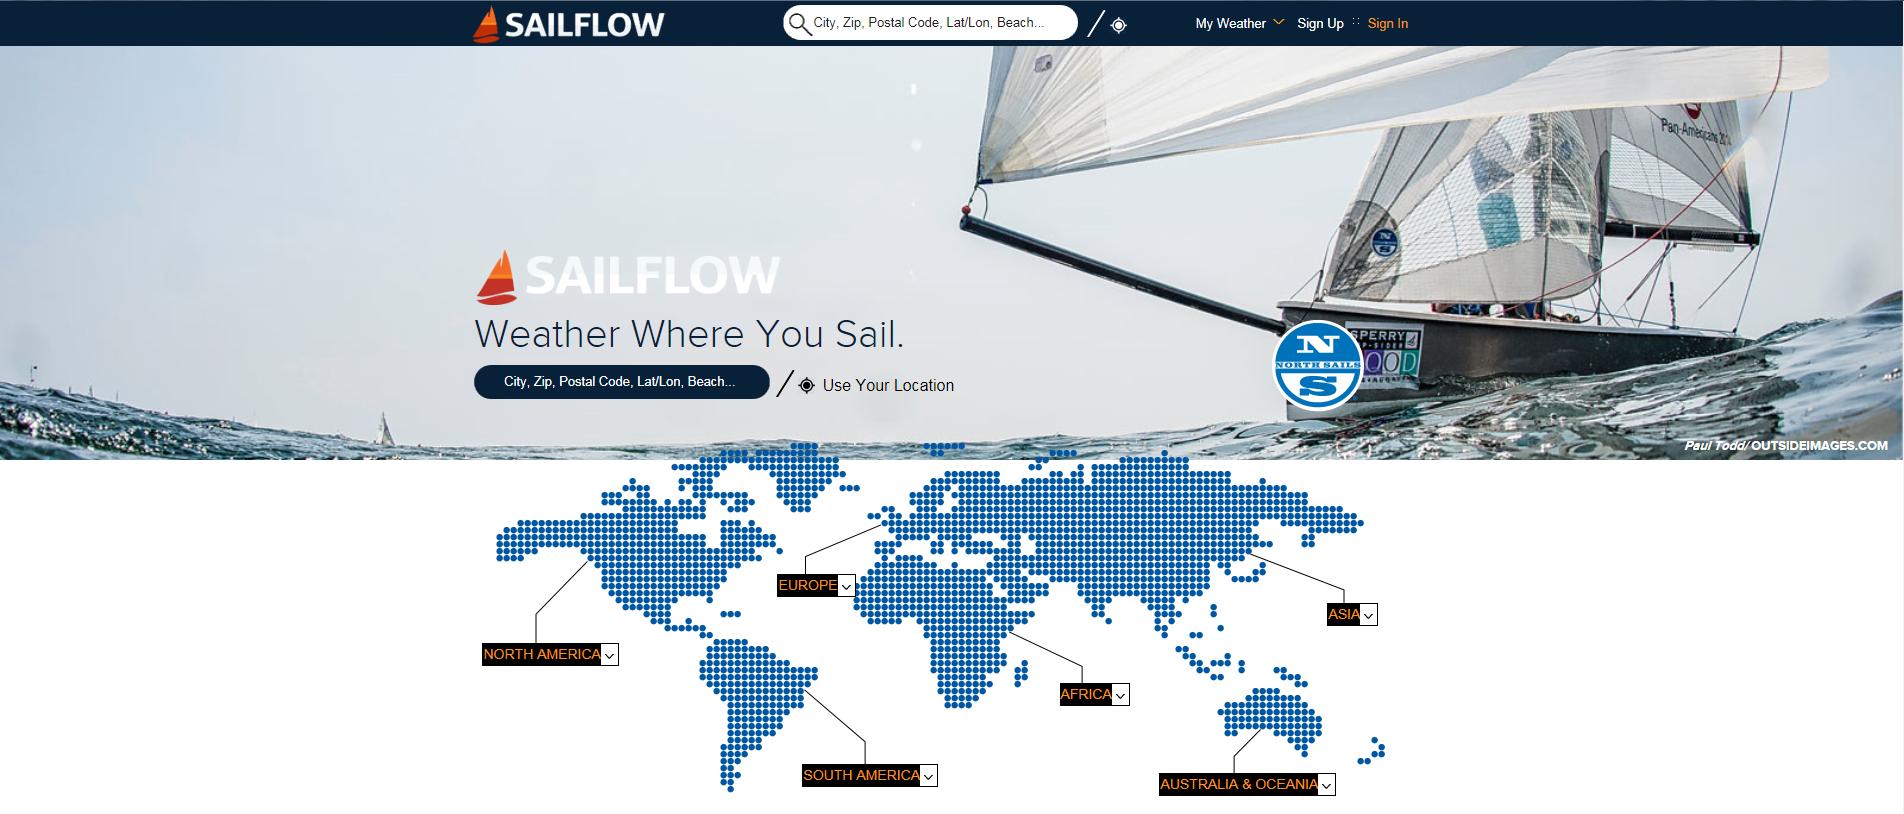 sailflow_newhomepage